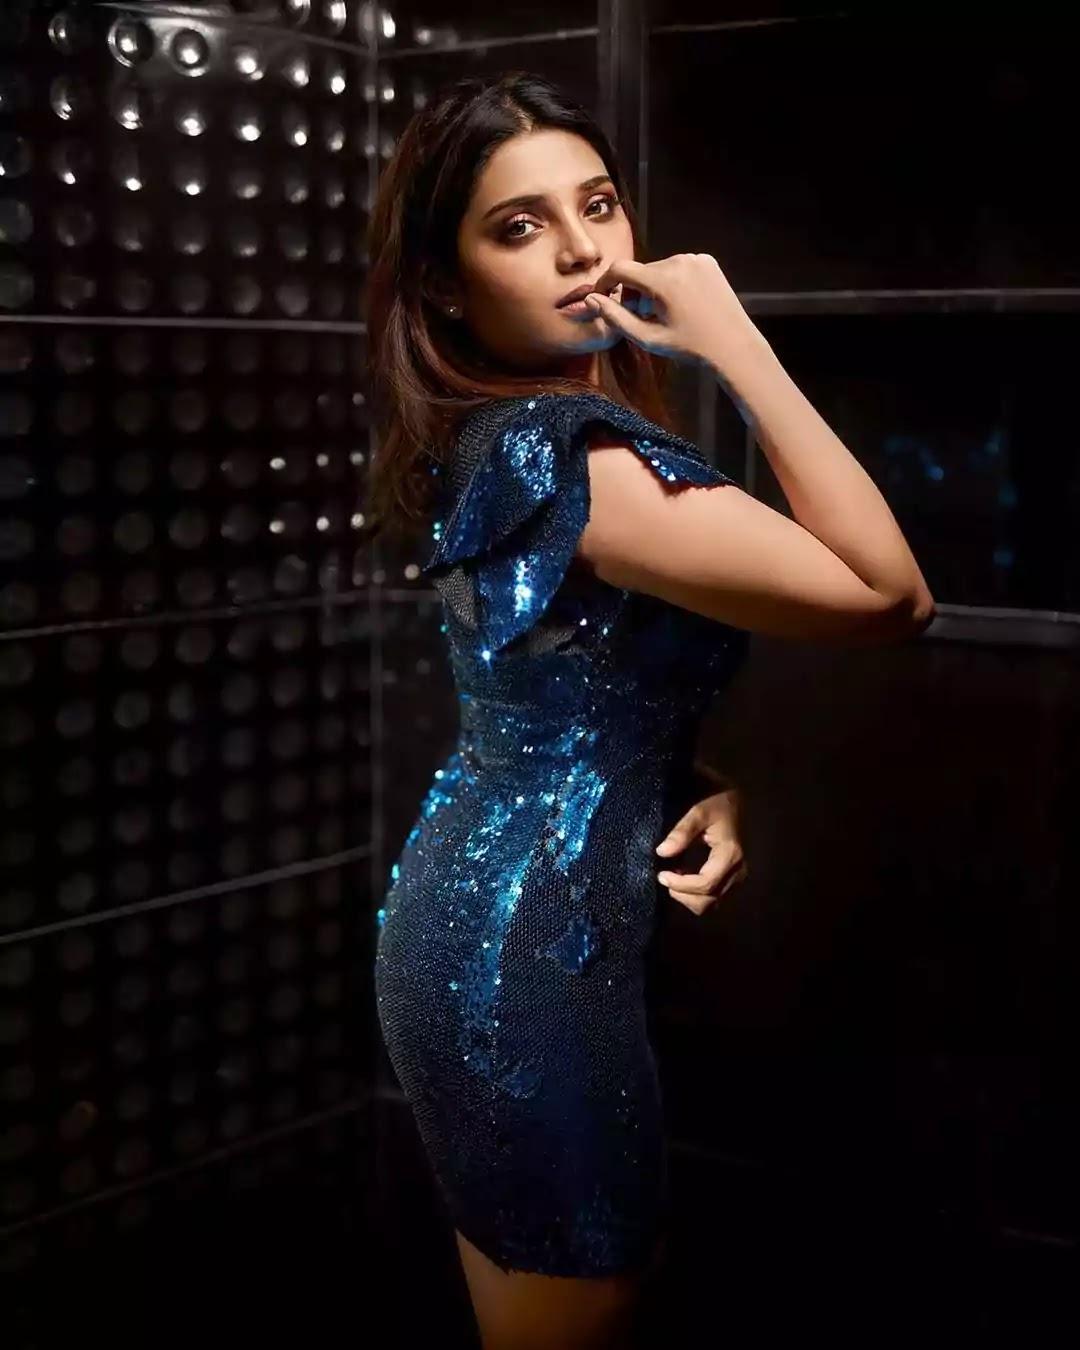 aathmika-hot-looks-in-blue-bodycon-mini-dress